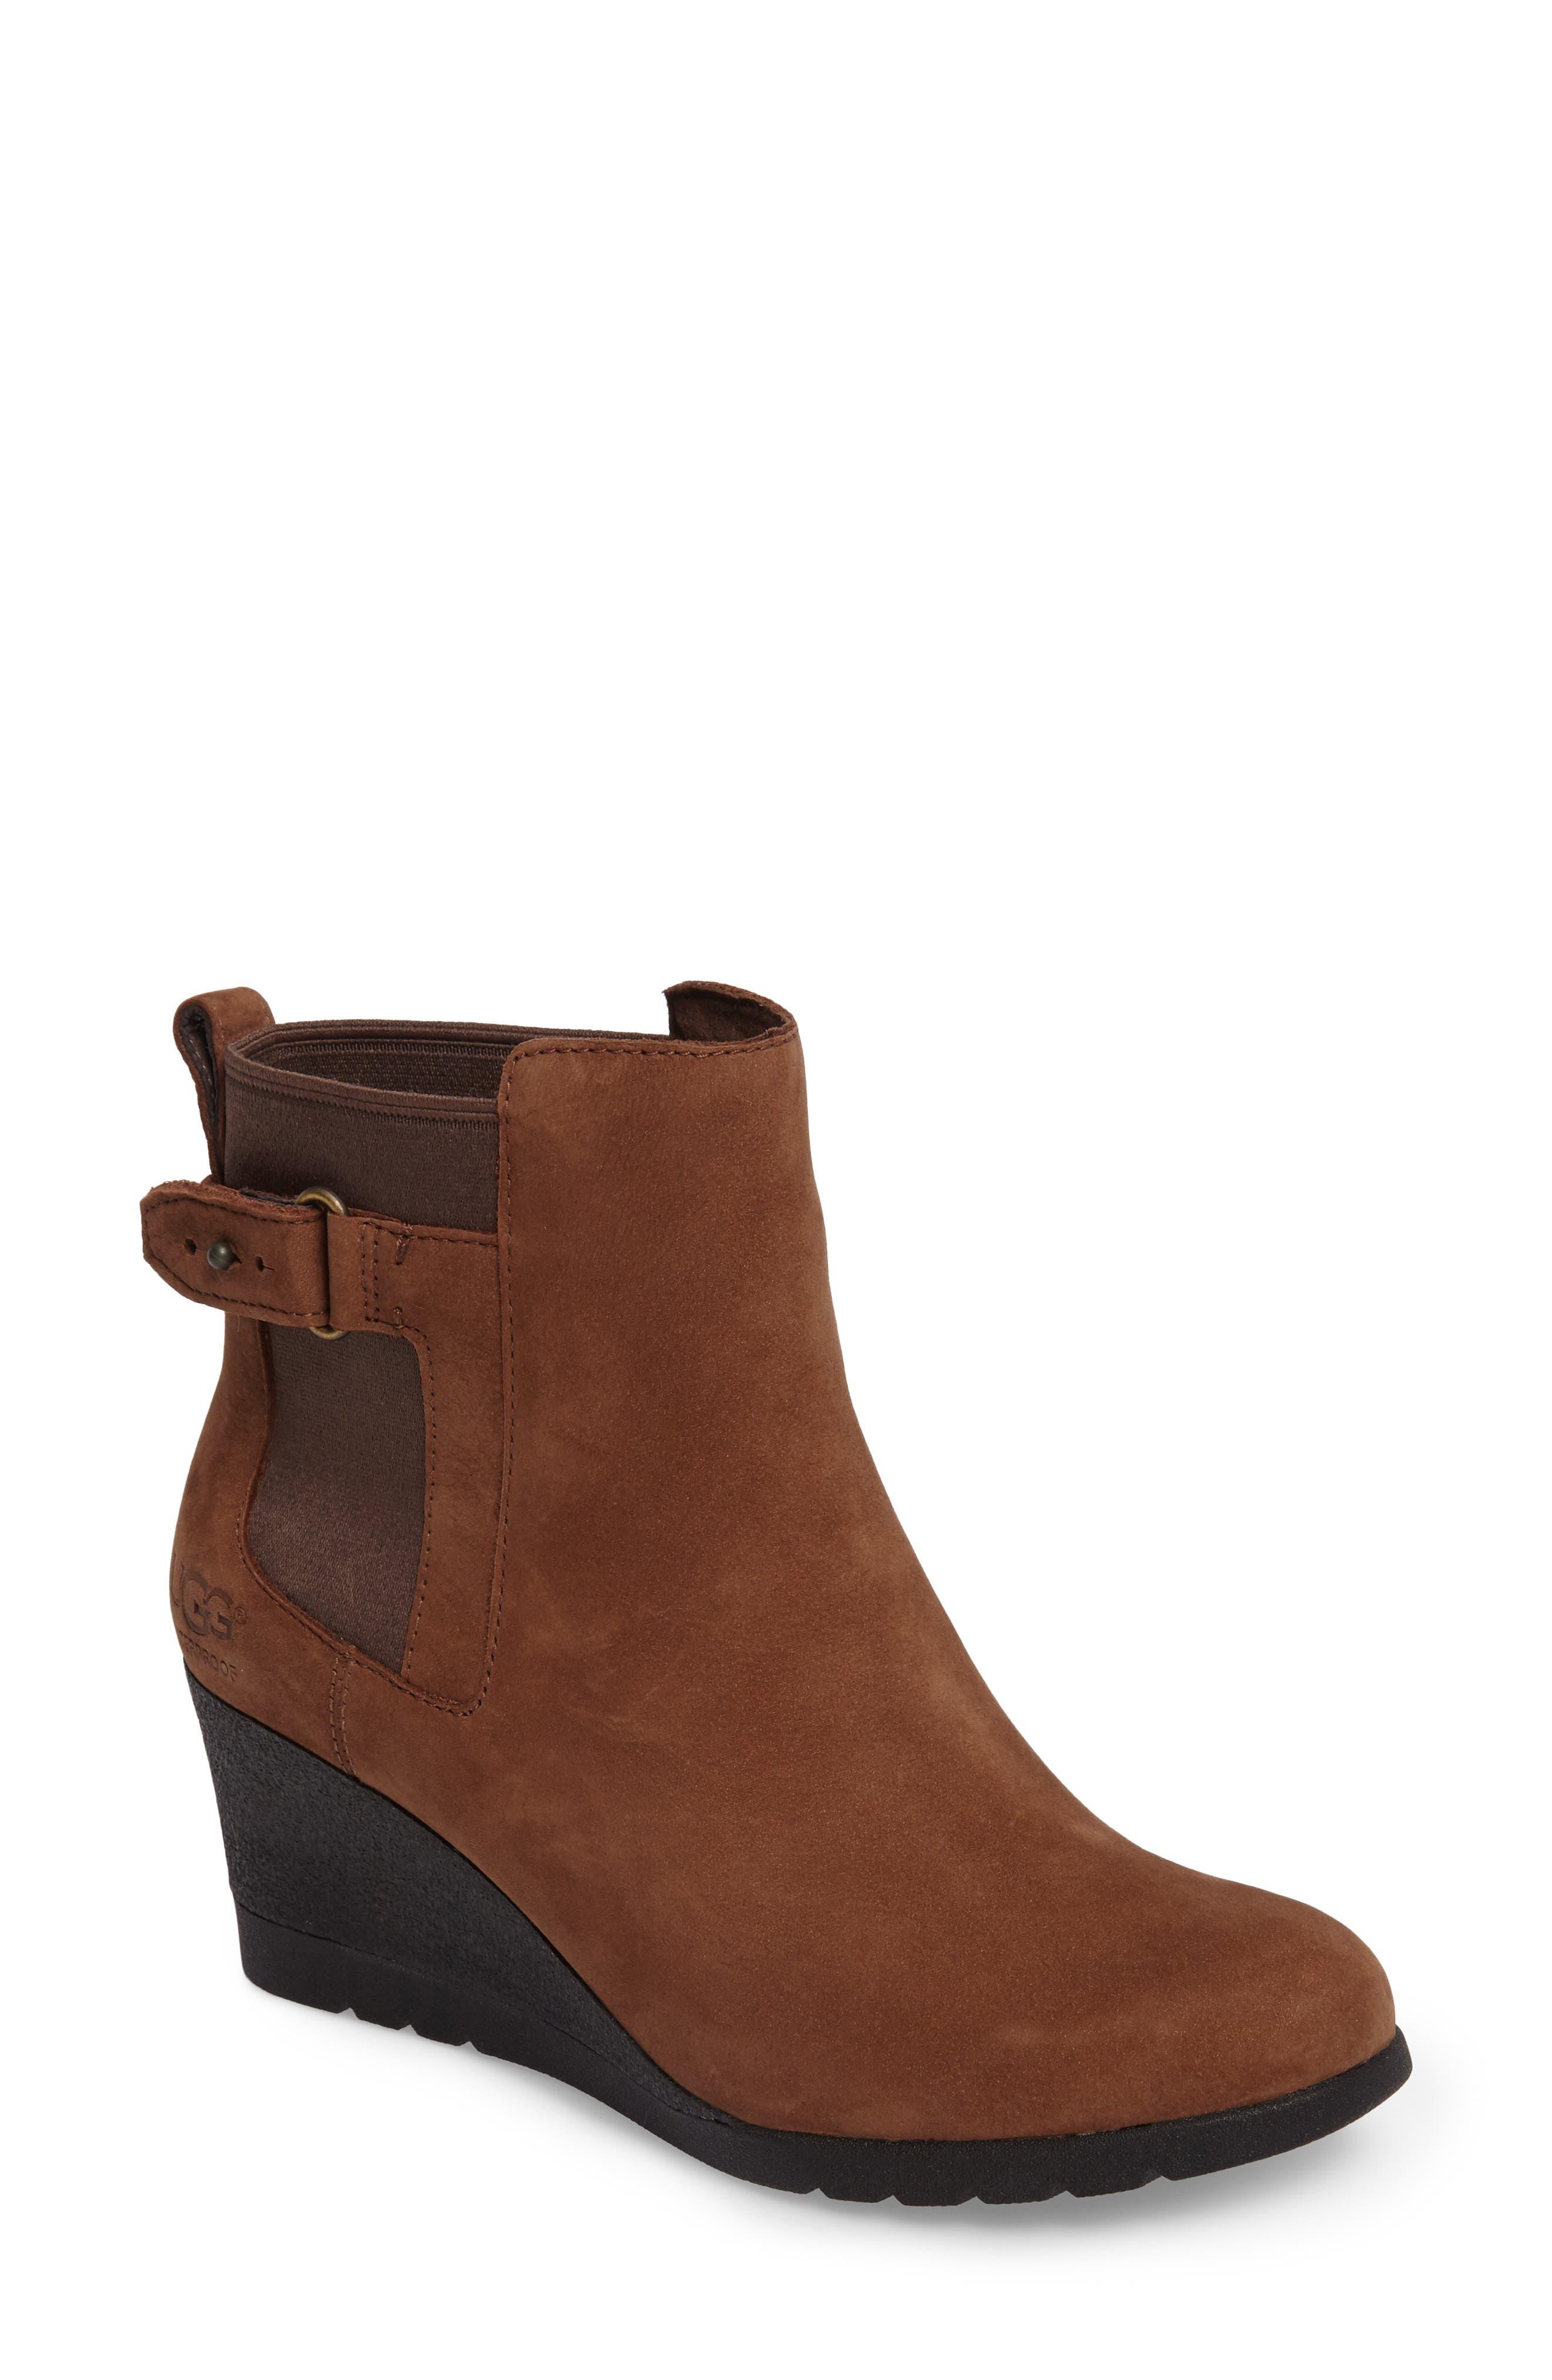 Alternate Image 1 Selected - UGG® Waterproof Insulated Wedge Boot (Women)